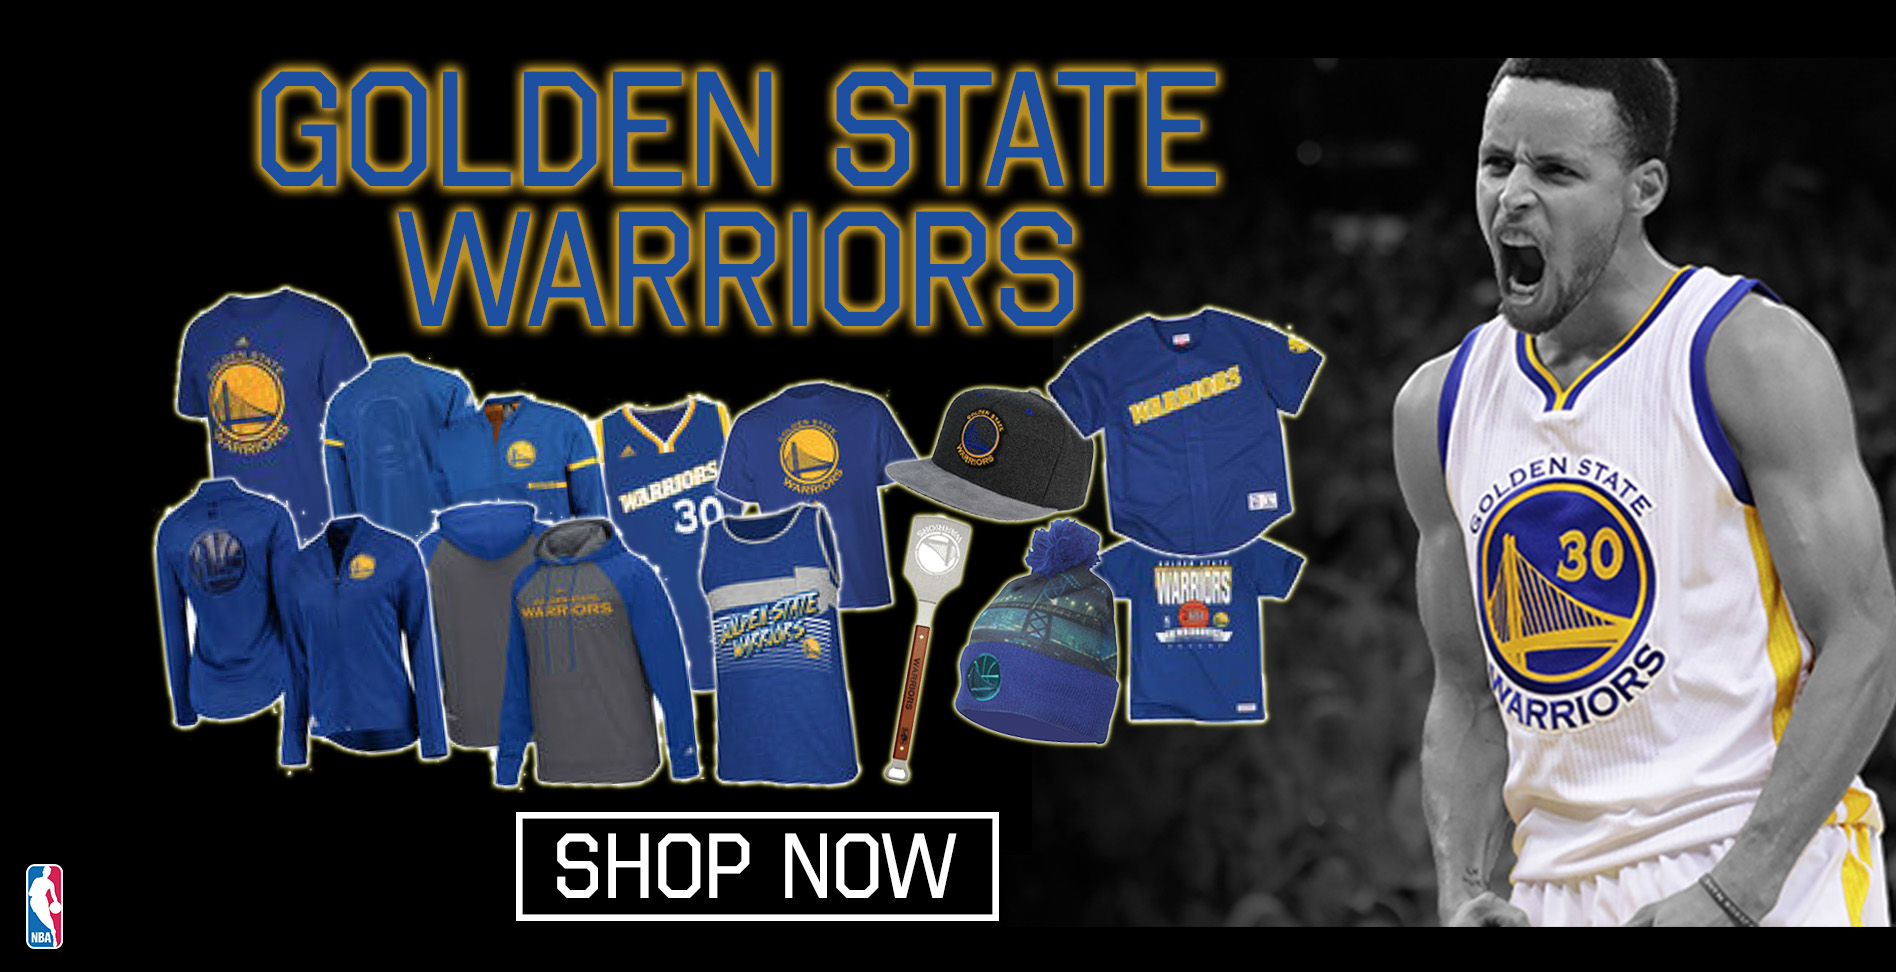 Golden State Warriors Merchendise